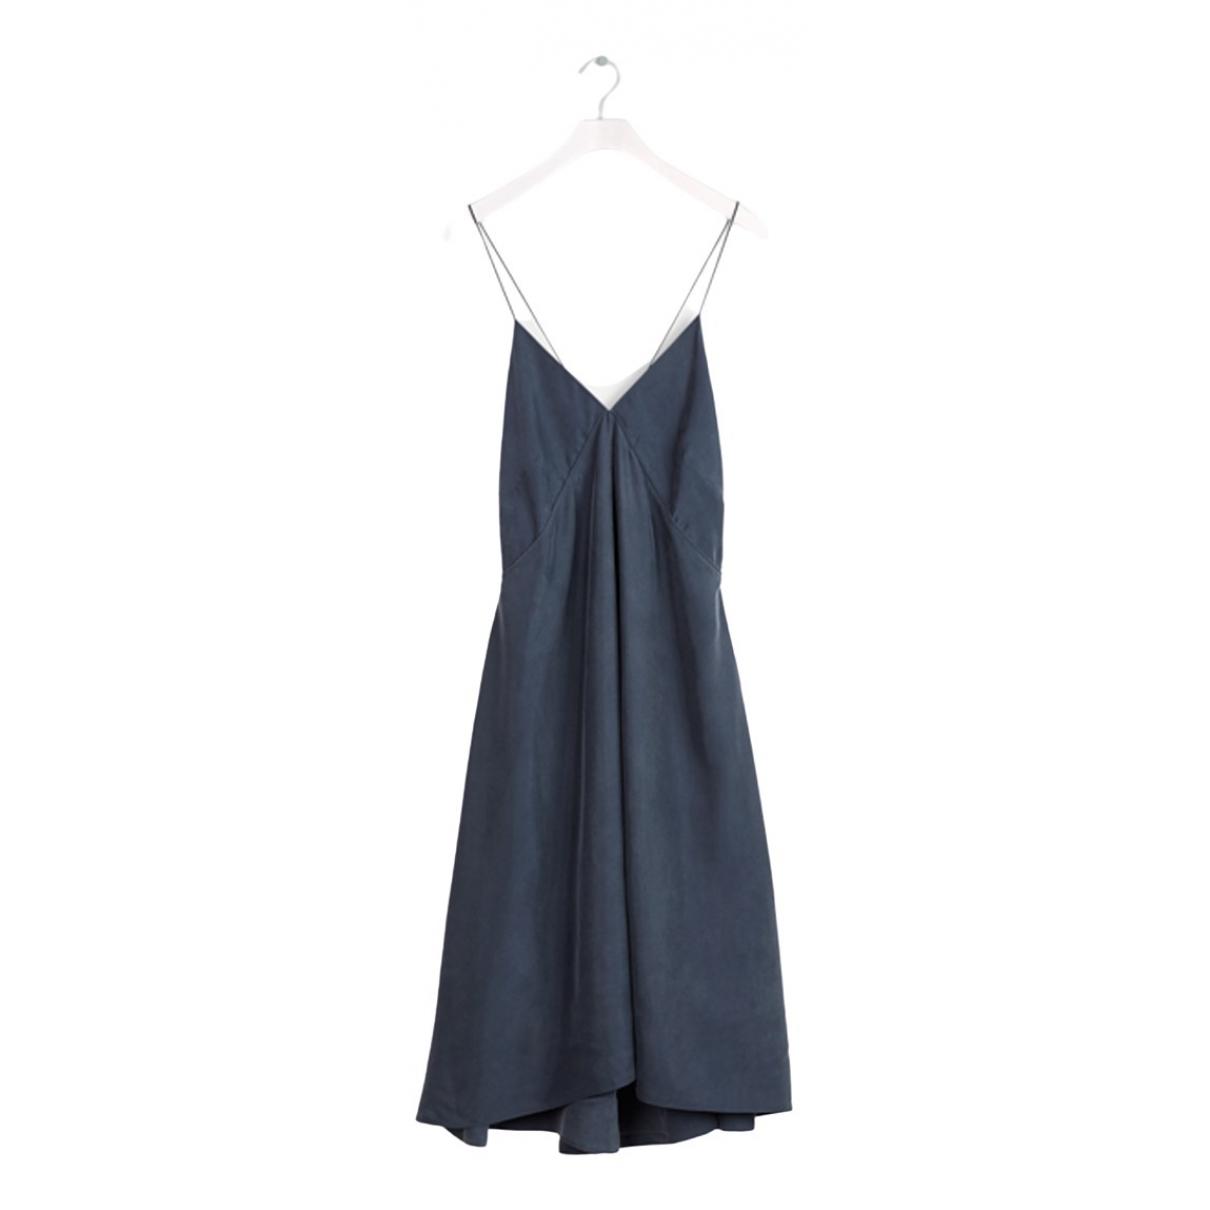 Filippa K \N Navy Silk dress for Women M International